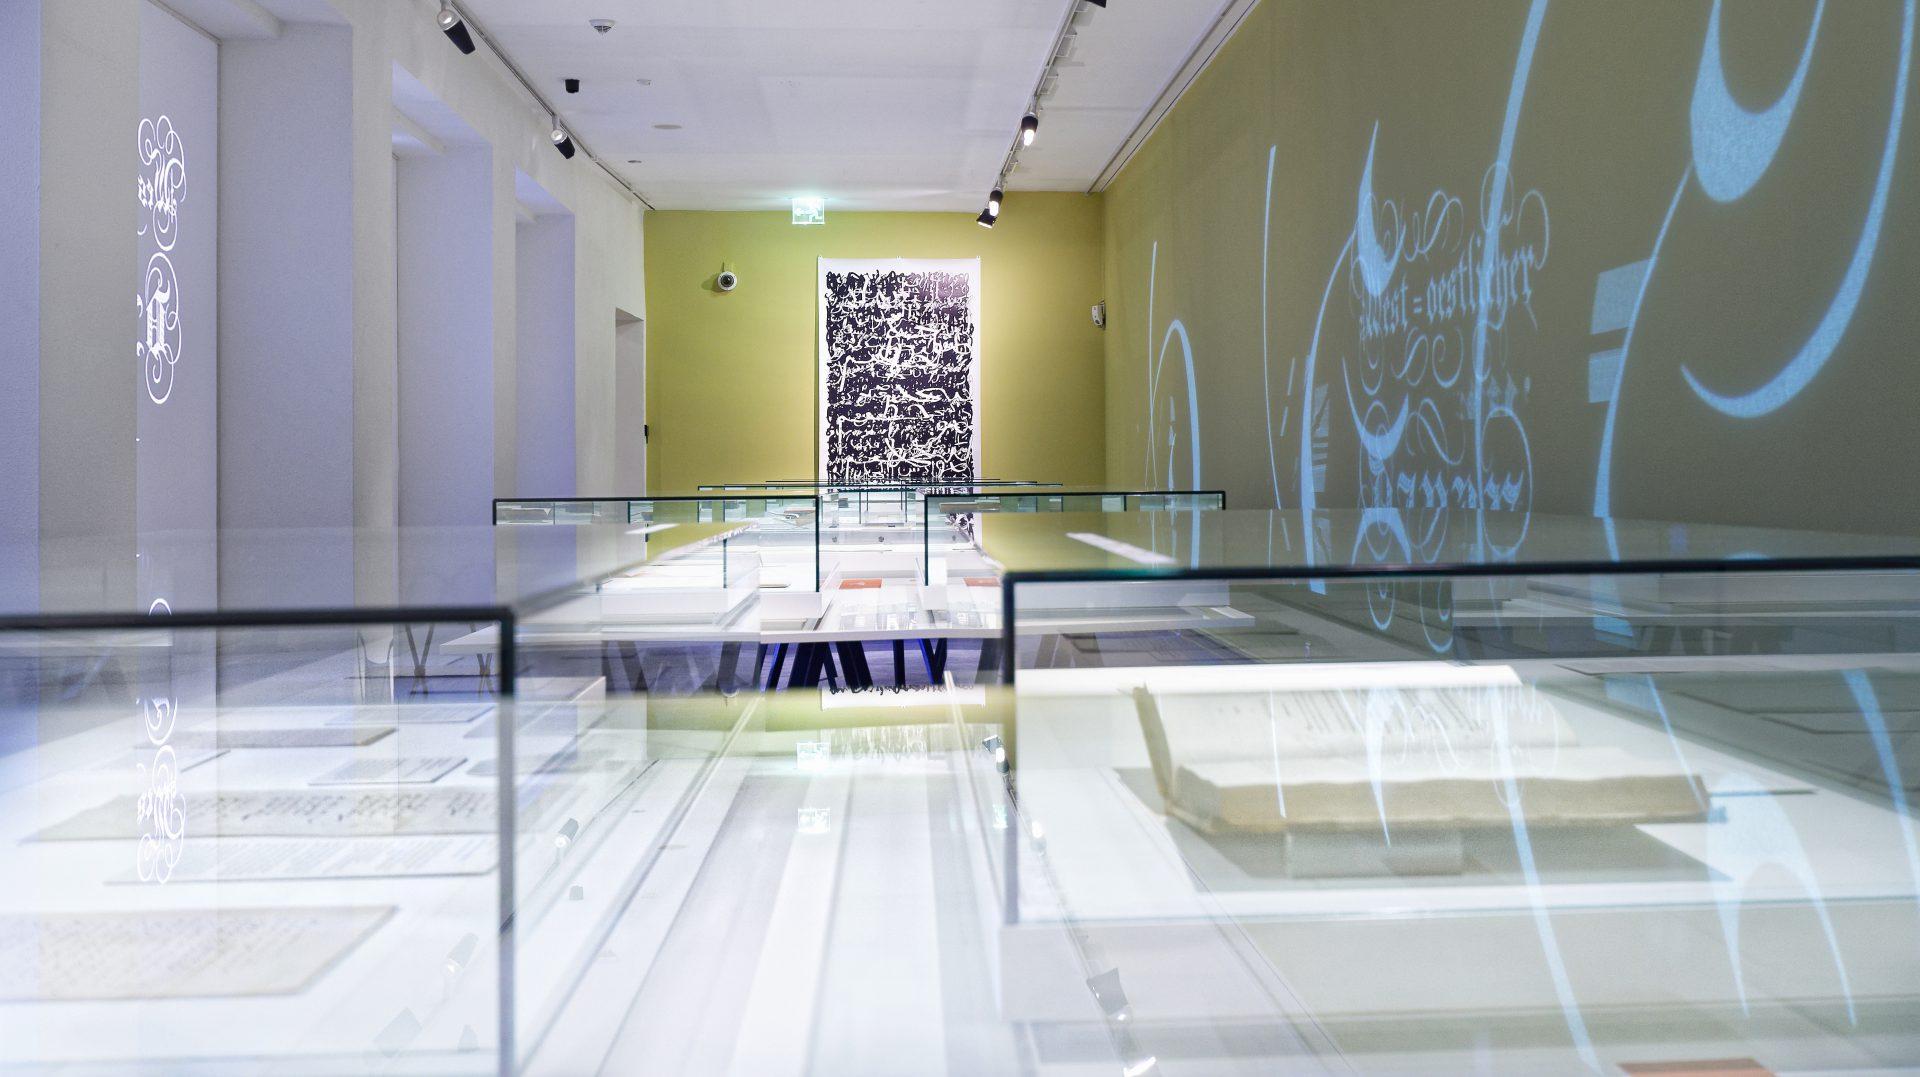 Palimpsest 015, 205 x 137 cm, Eco-Solvent-Tinte auf LKW-PLane, 2017